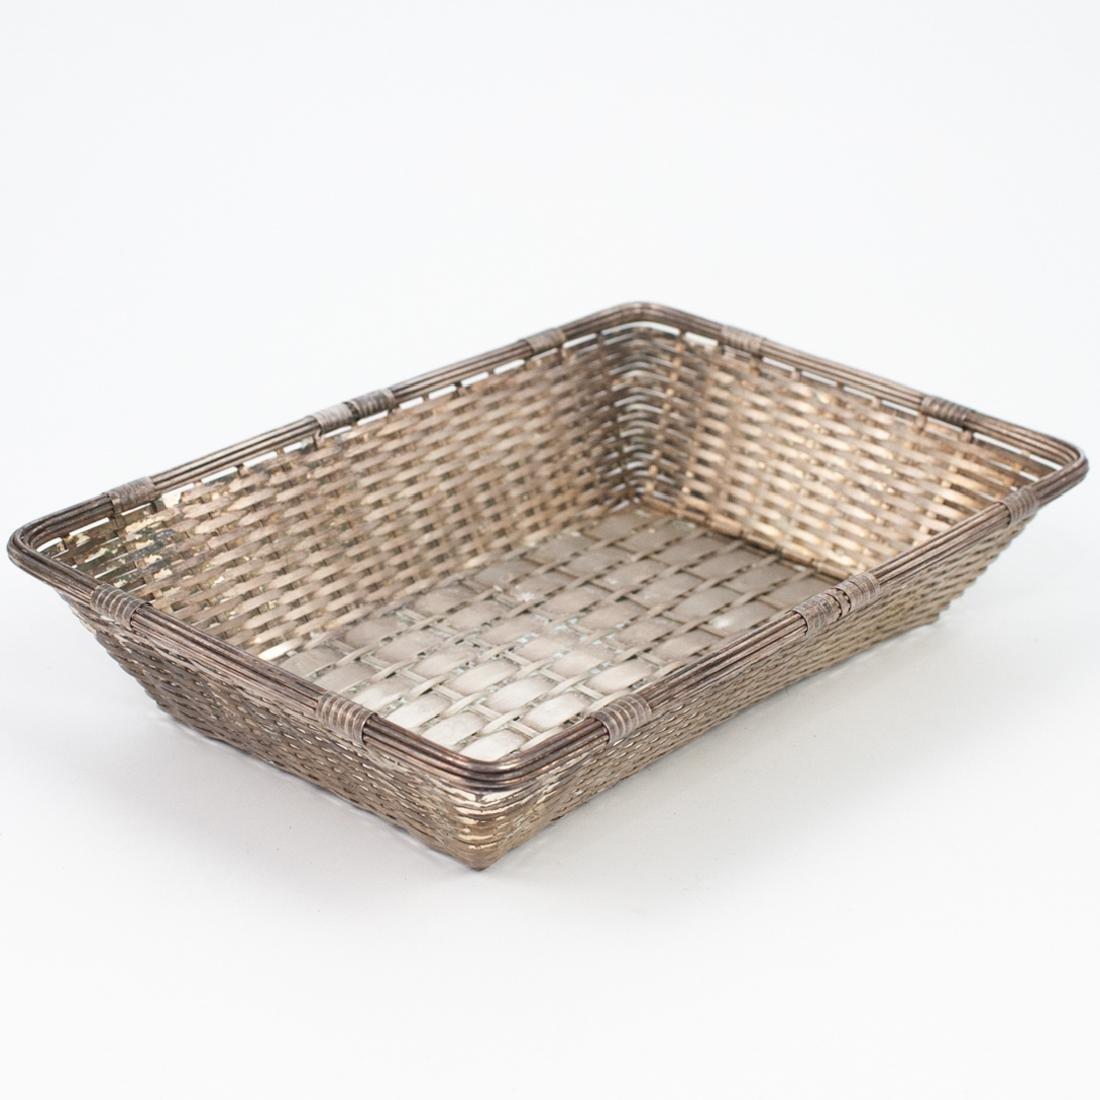 Christofle Silver-Plated Basket